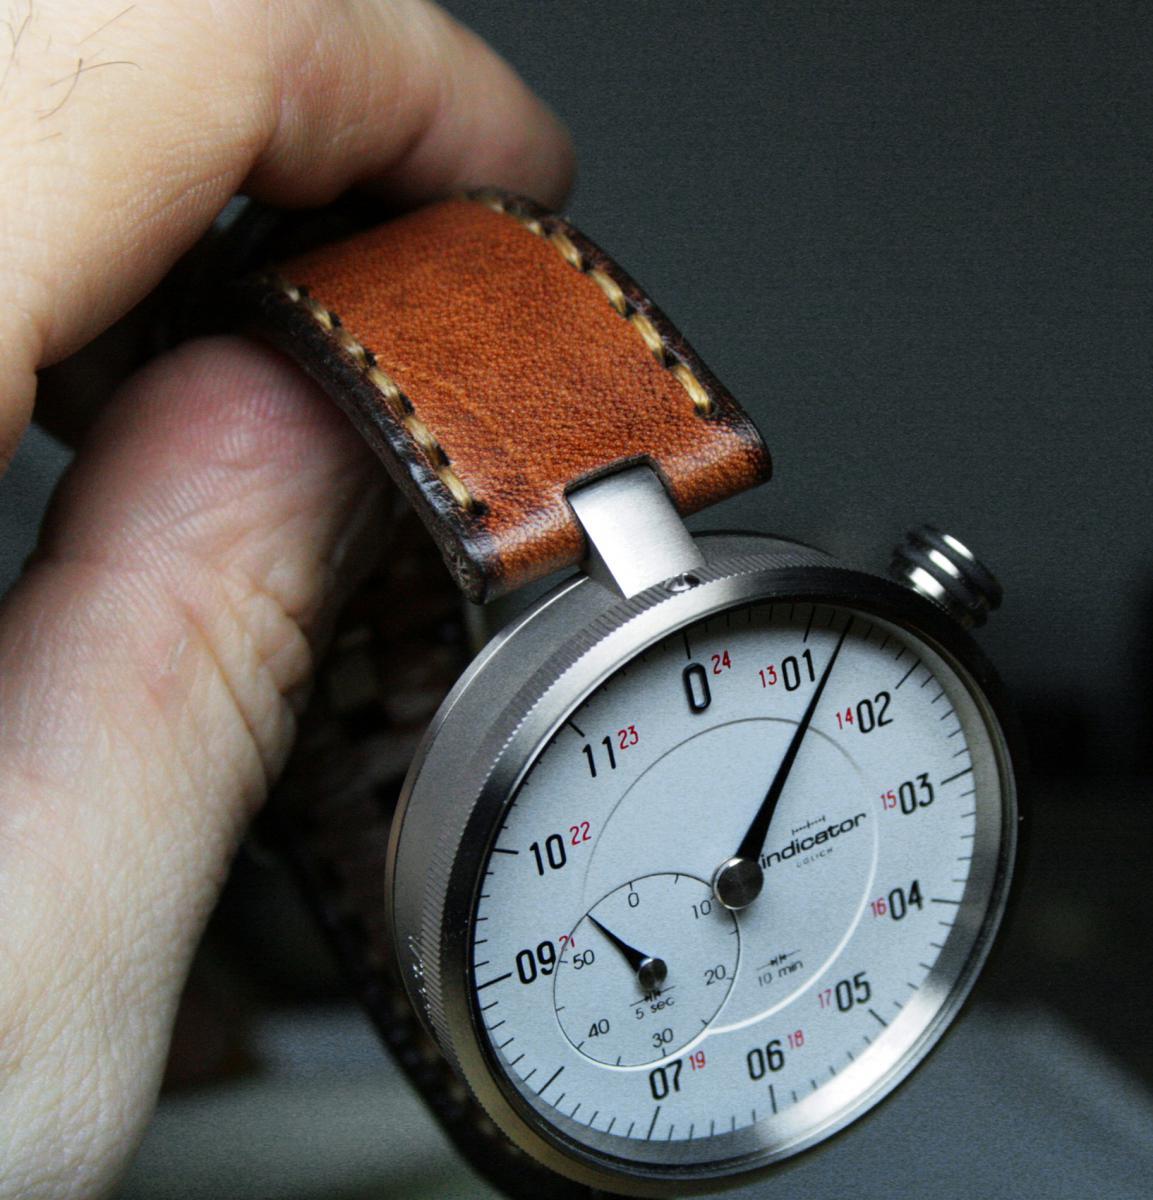 New RUSSIAN time tool INDICATOR-img_7438.jpg